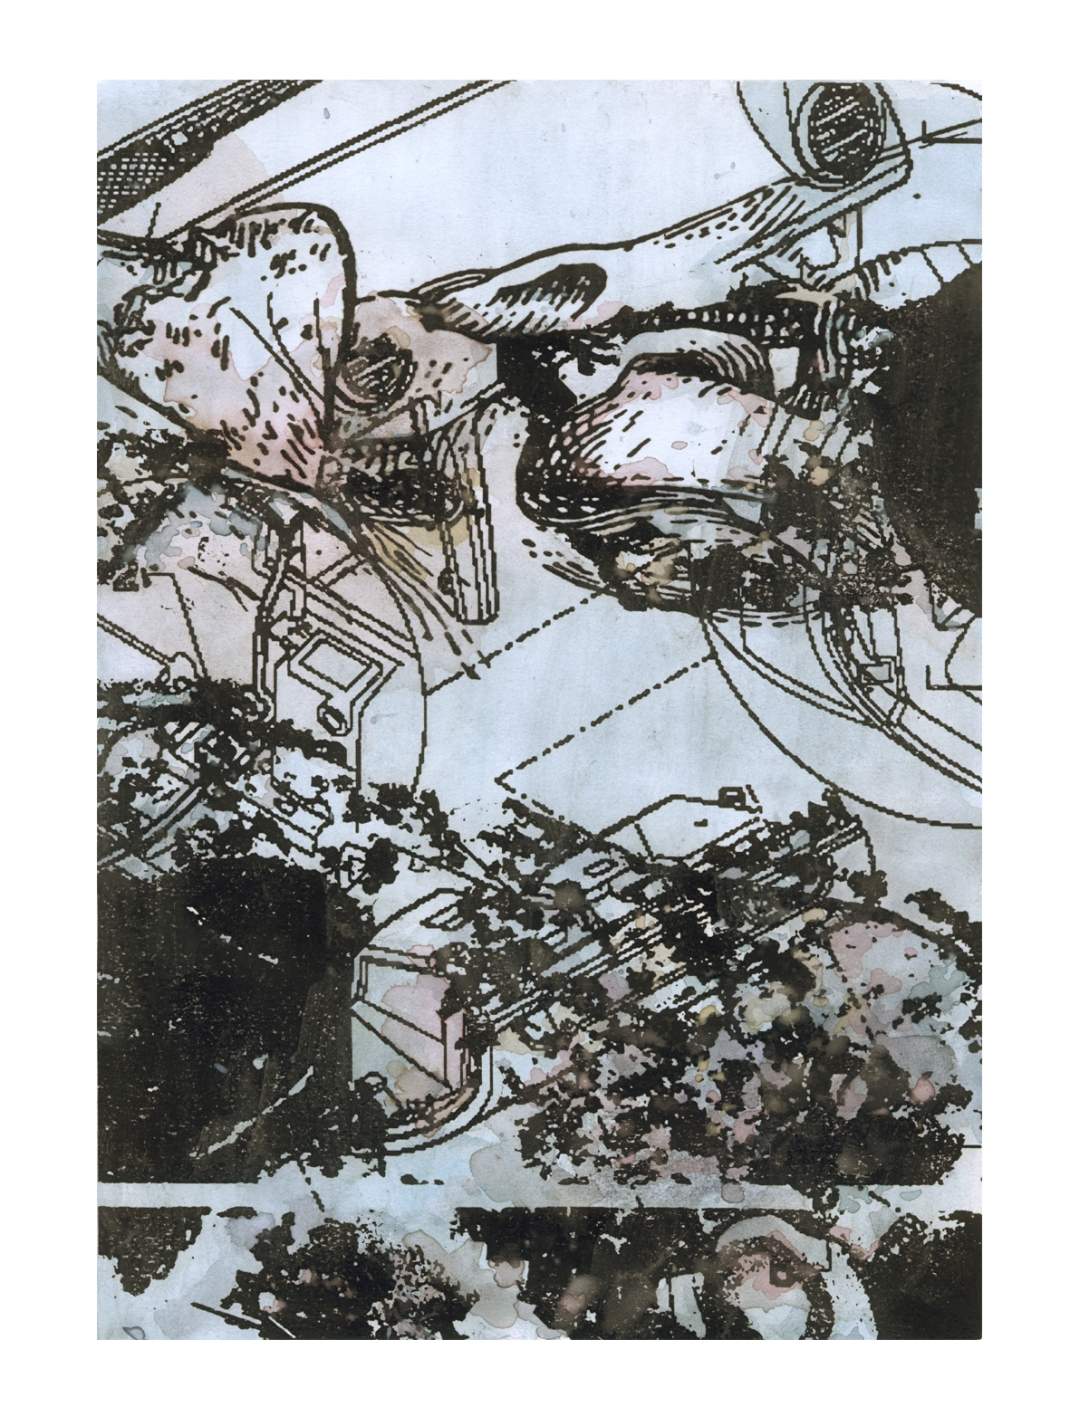 asbjorn-skou-bones-butterfly-crash